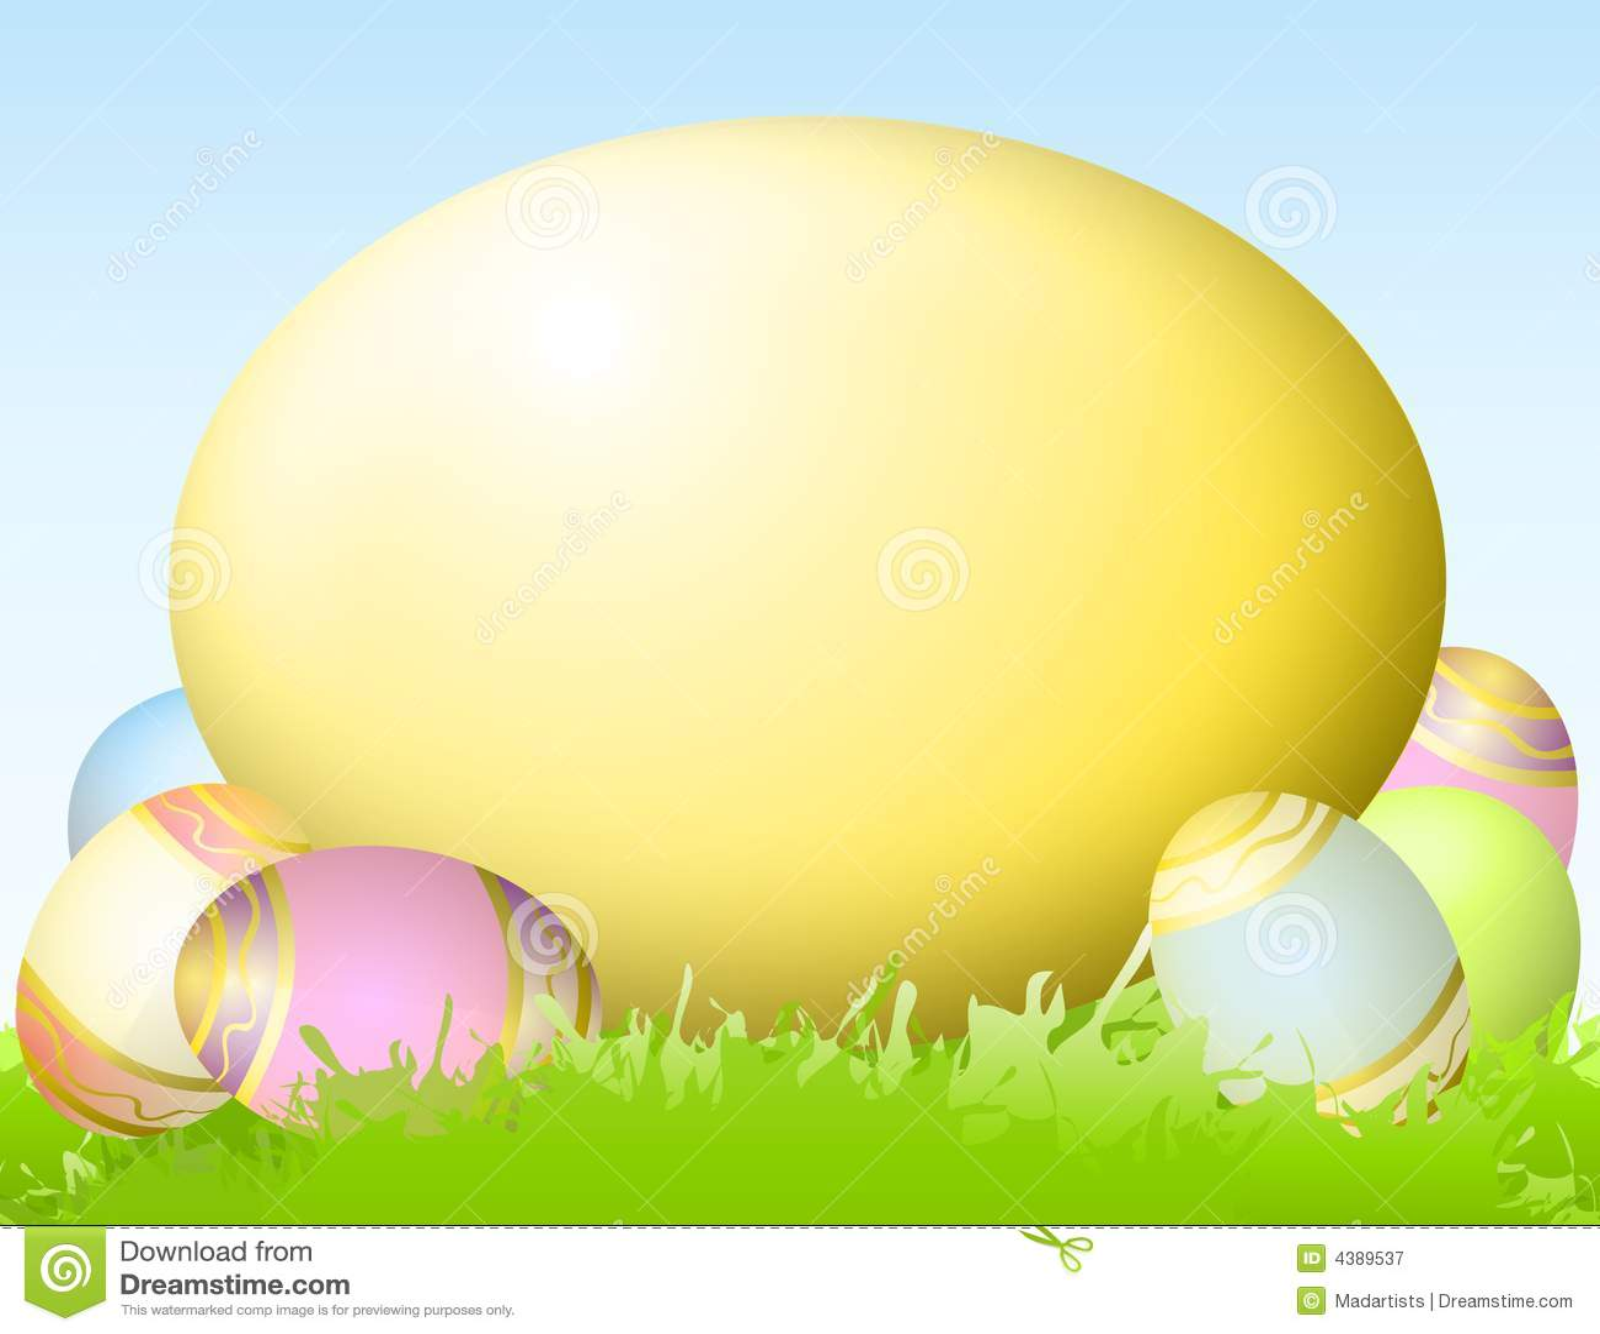 Big Yellow Easter Egg